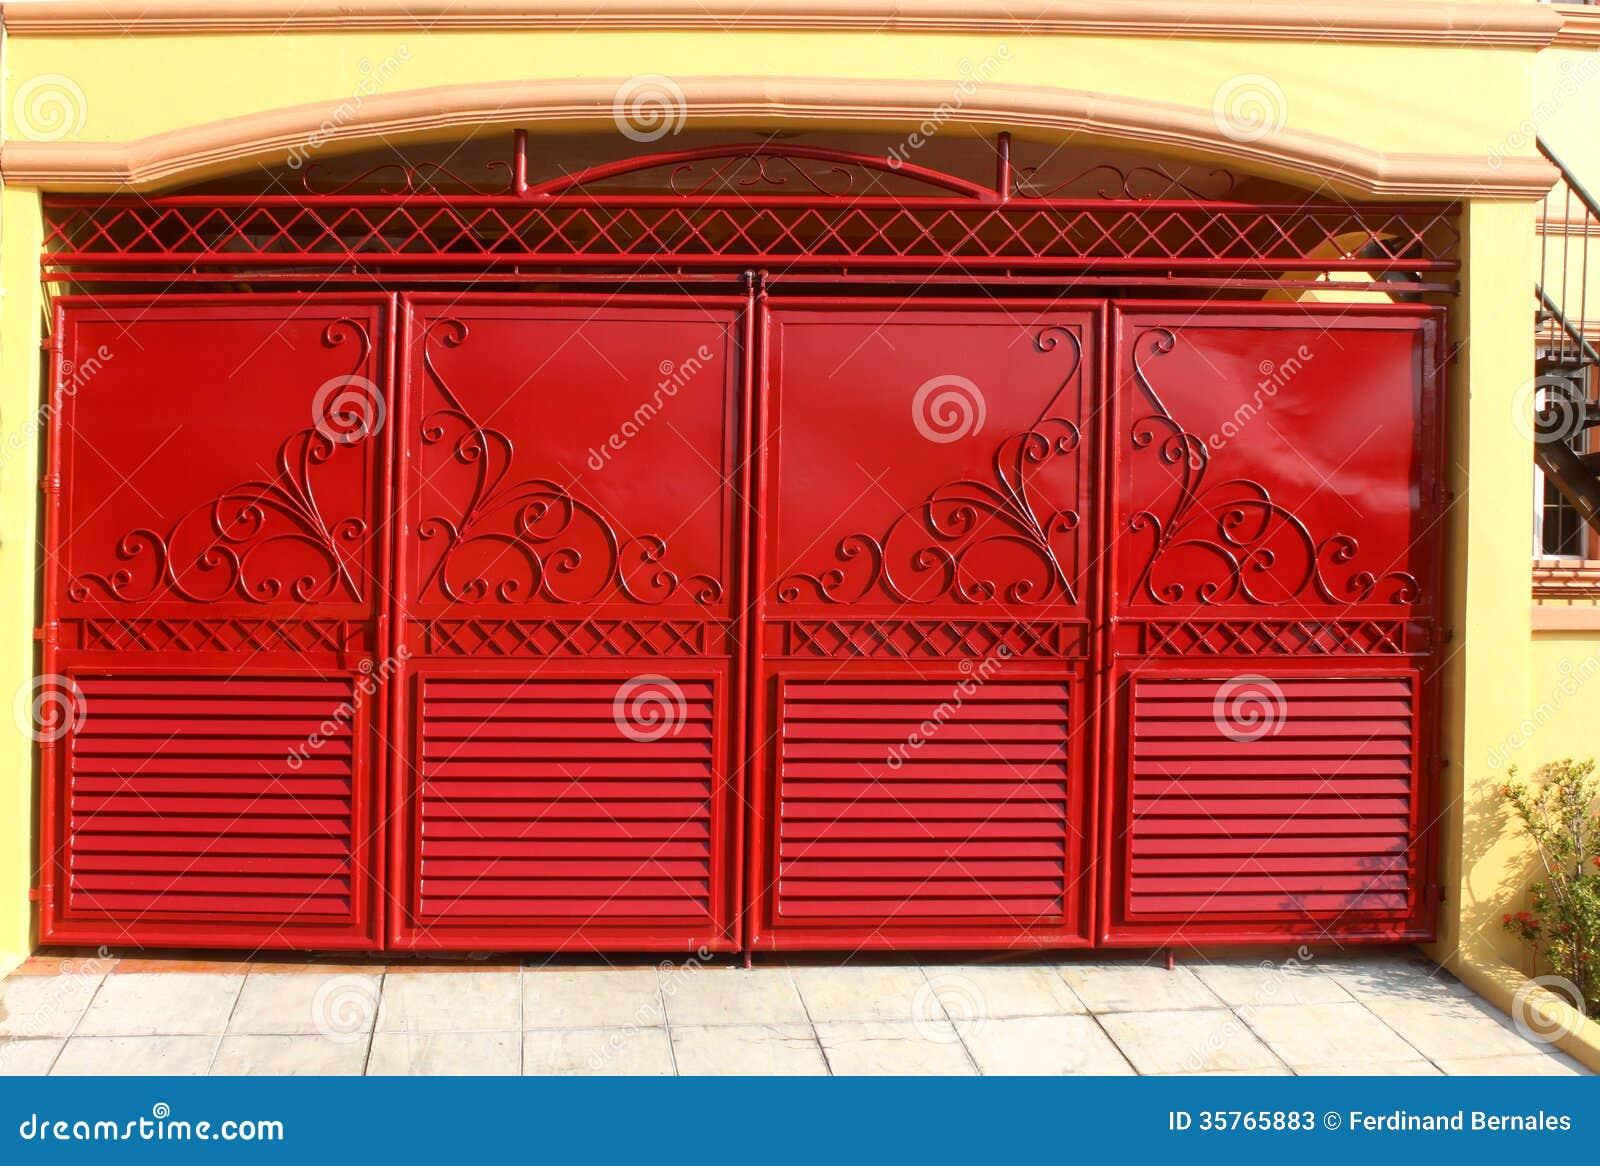 Home Design Gate Ideas: Garage Gate Stock Photos